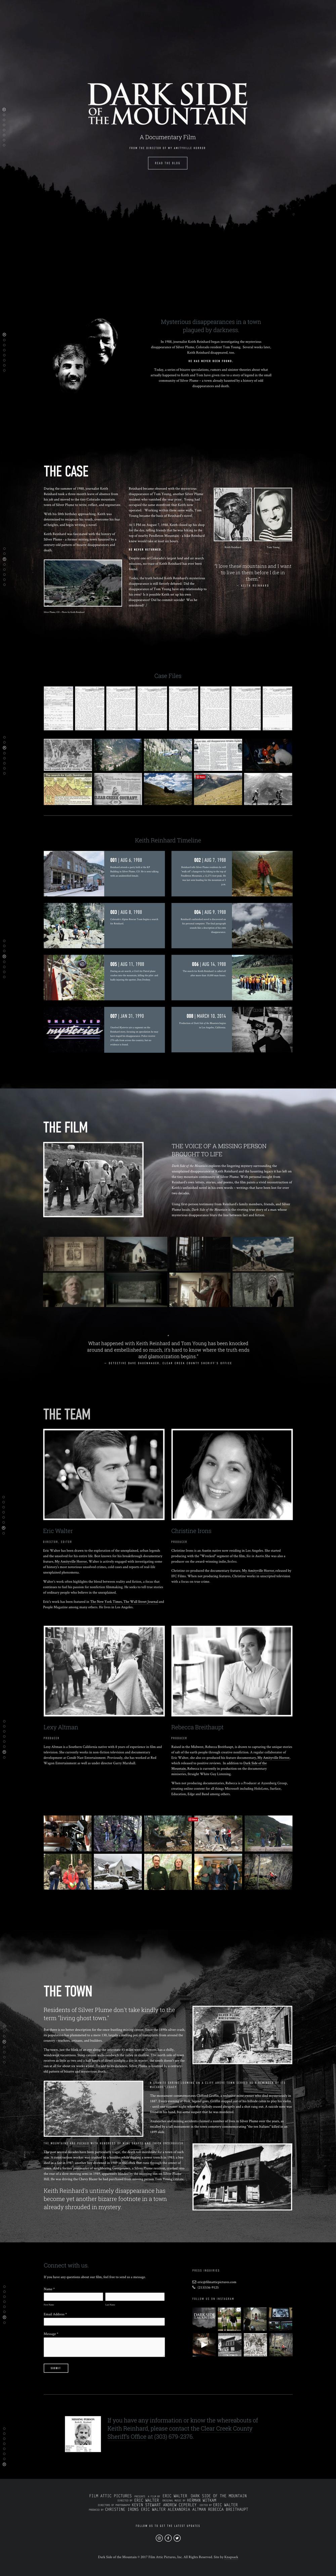 Dark_side_of_the_mountain-desktop-screenshot.png